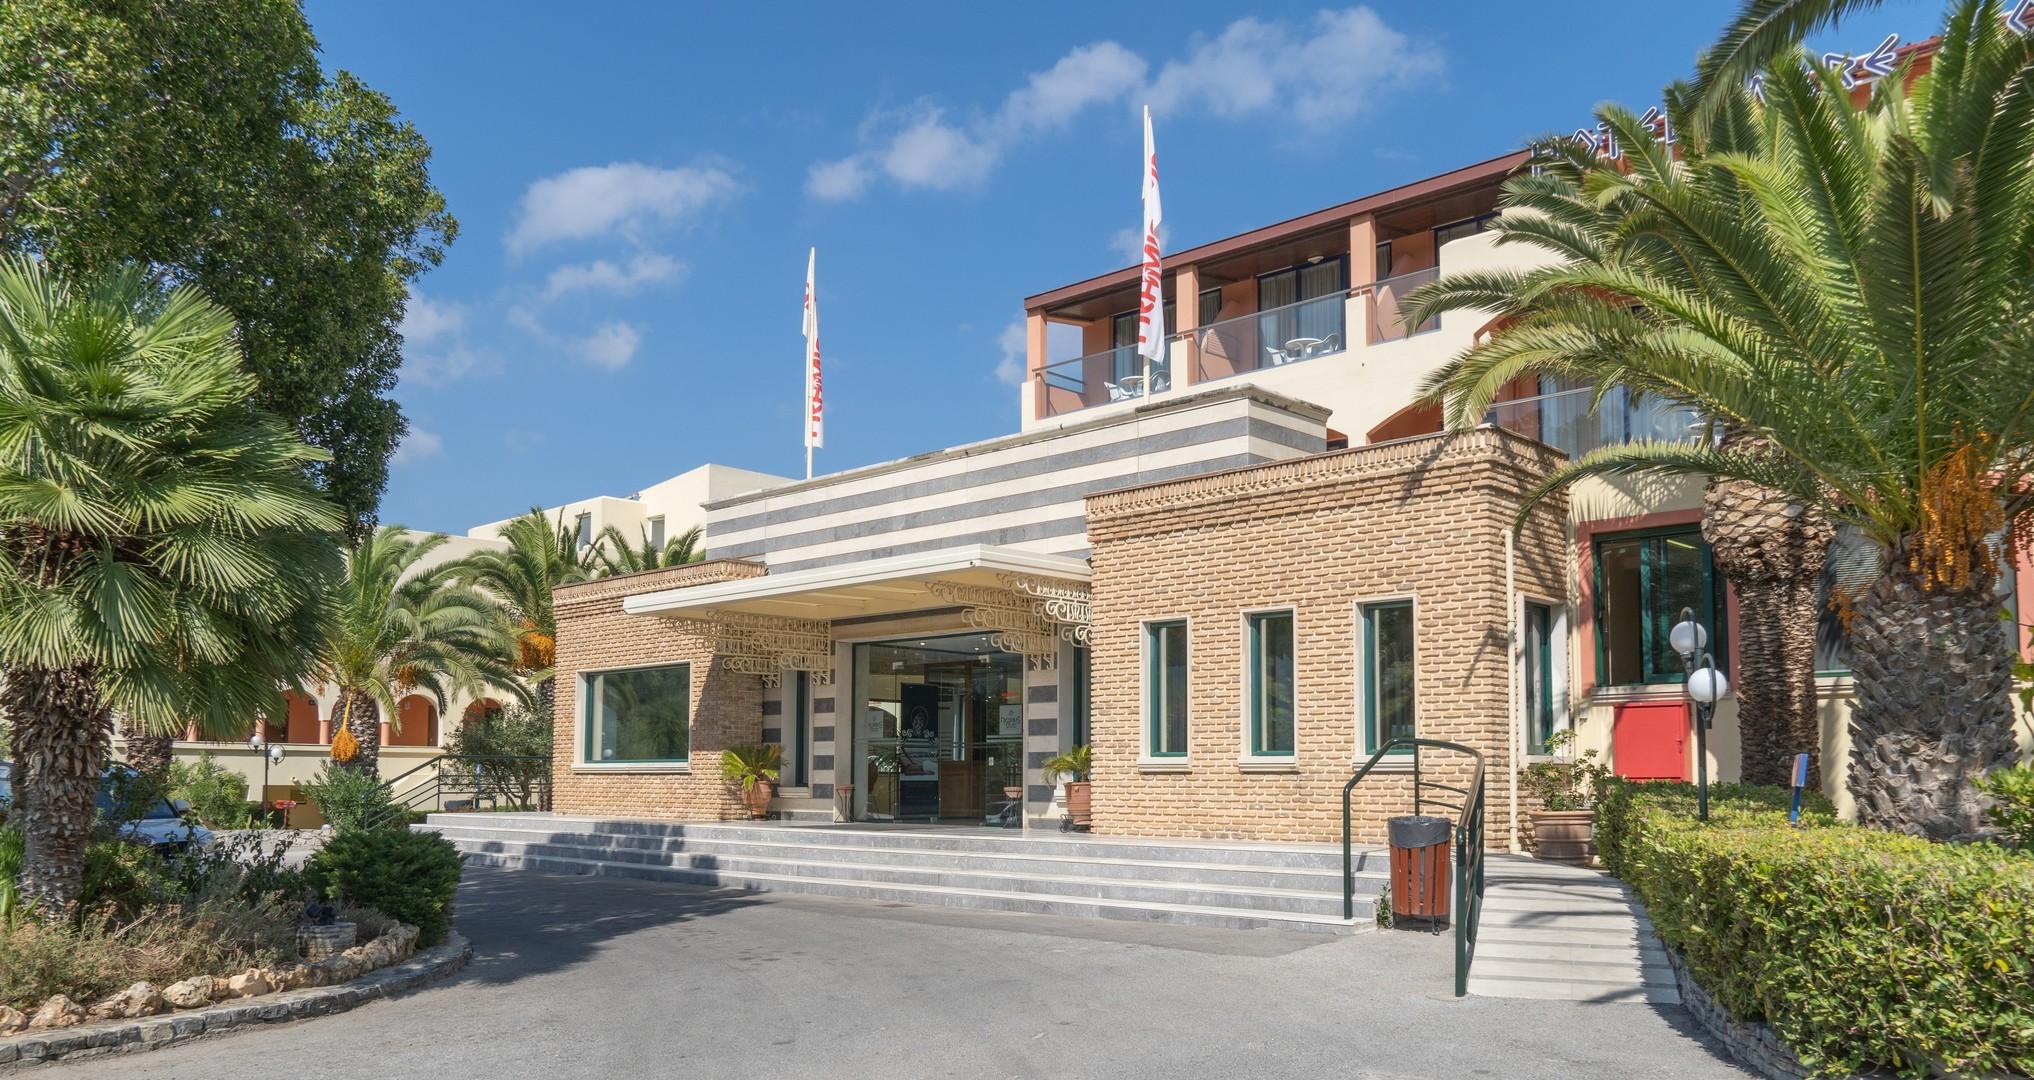 Hotel Mare Monte Beach #2